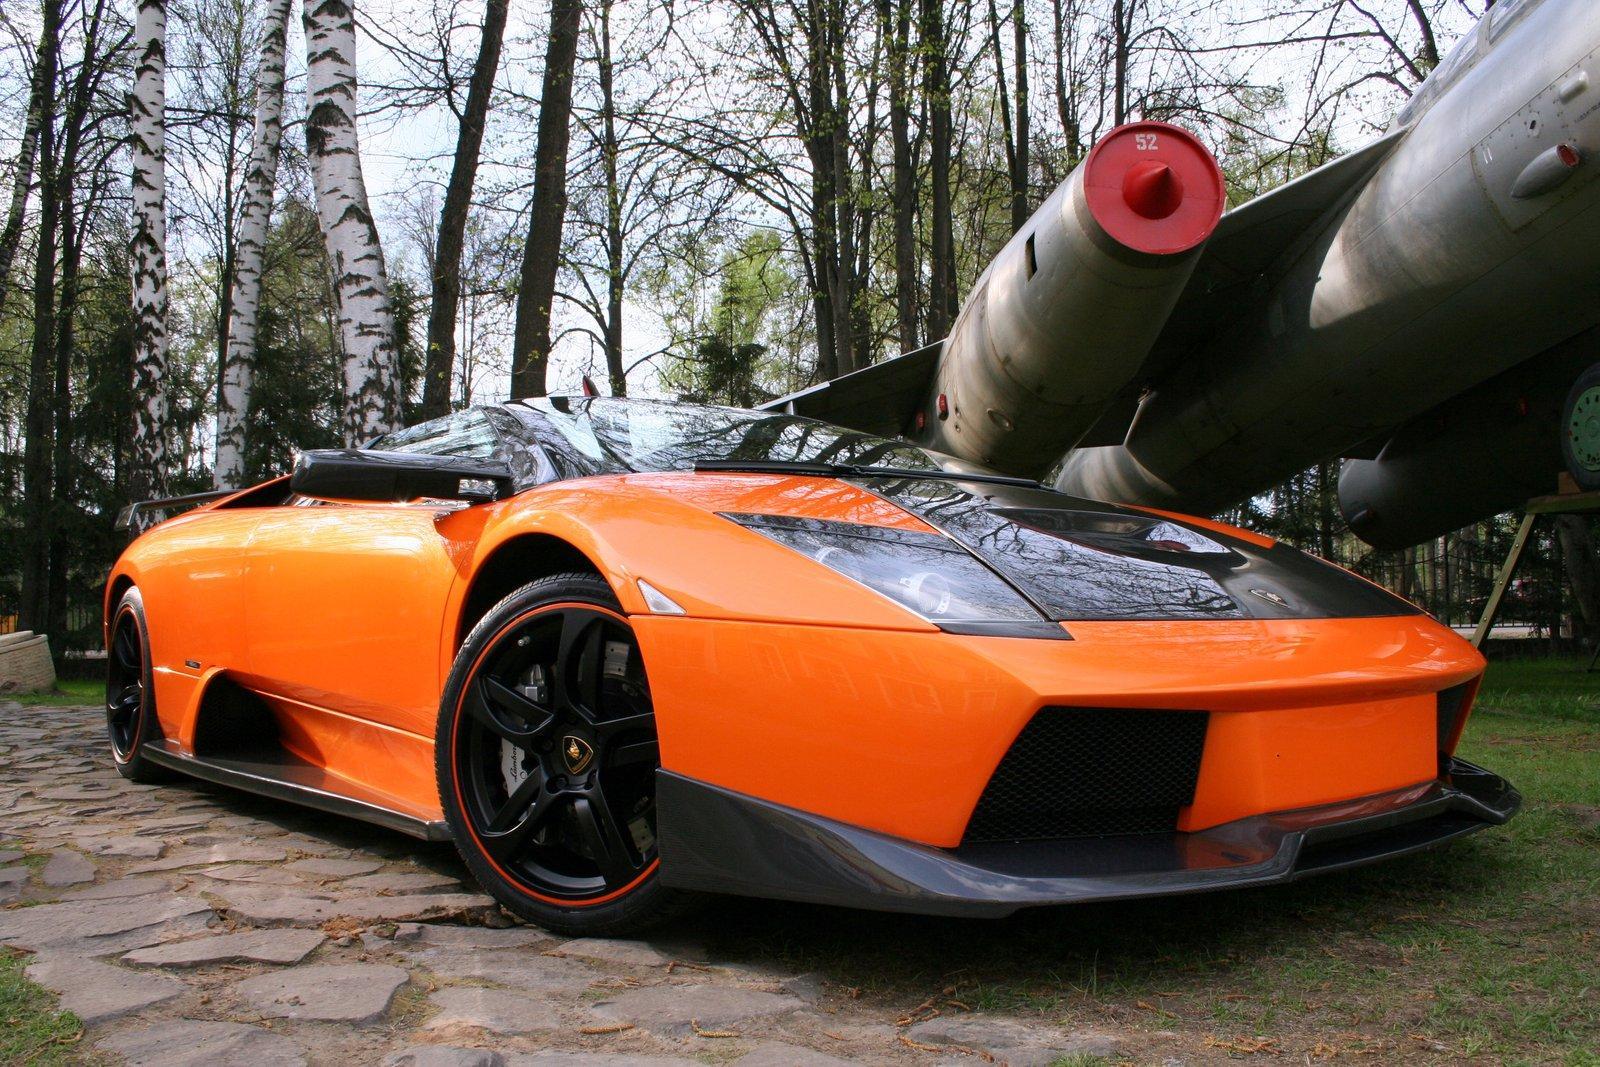 Lamborghini Murcielago уточнен Статус авто дизайн - фотография №12